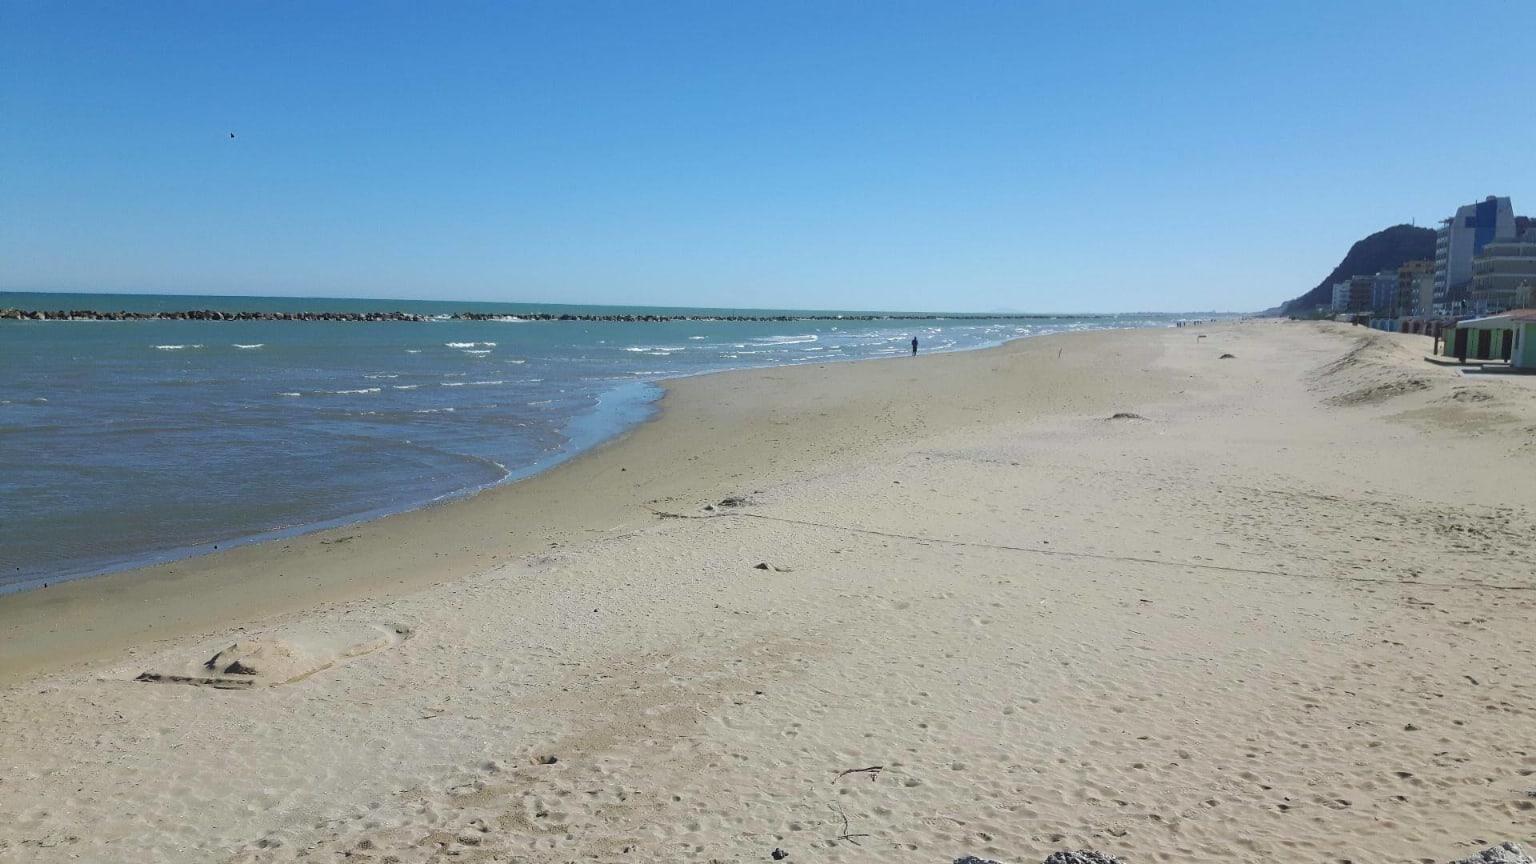 Spiaggia vicino Pesaro